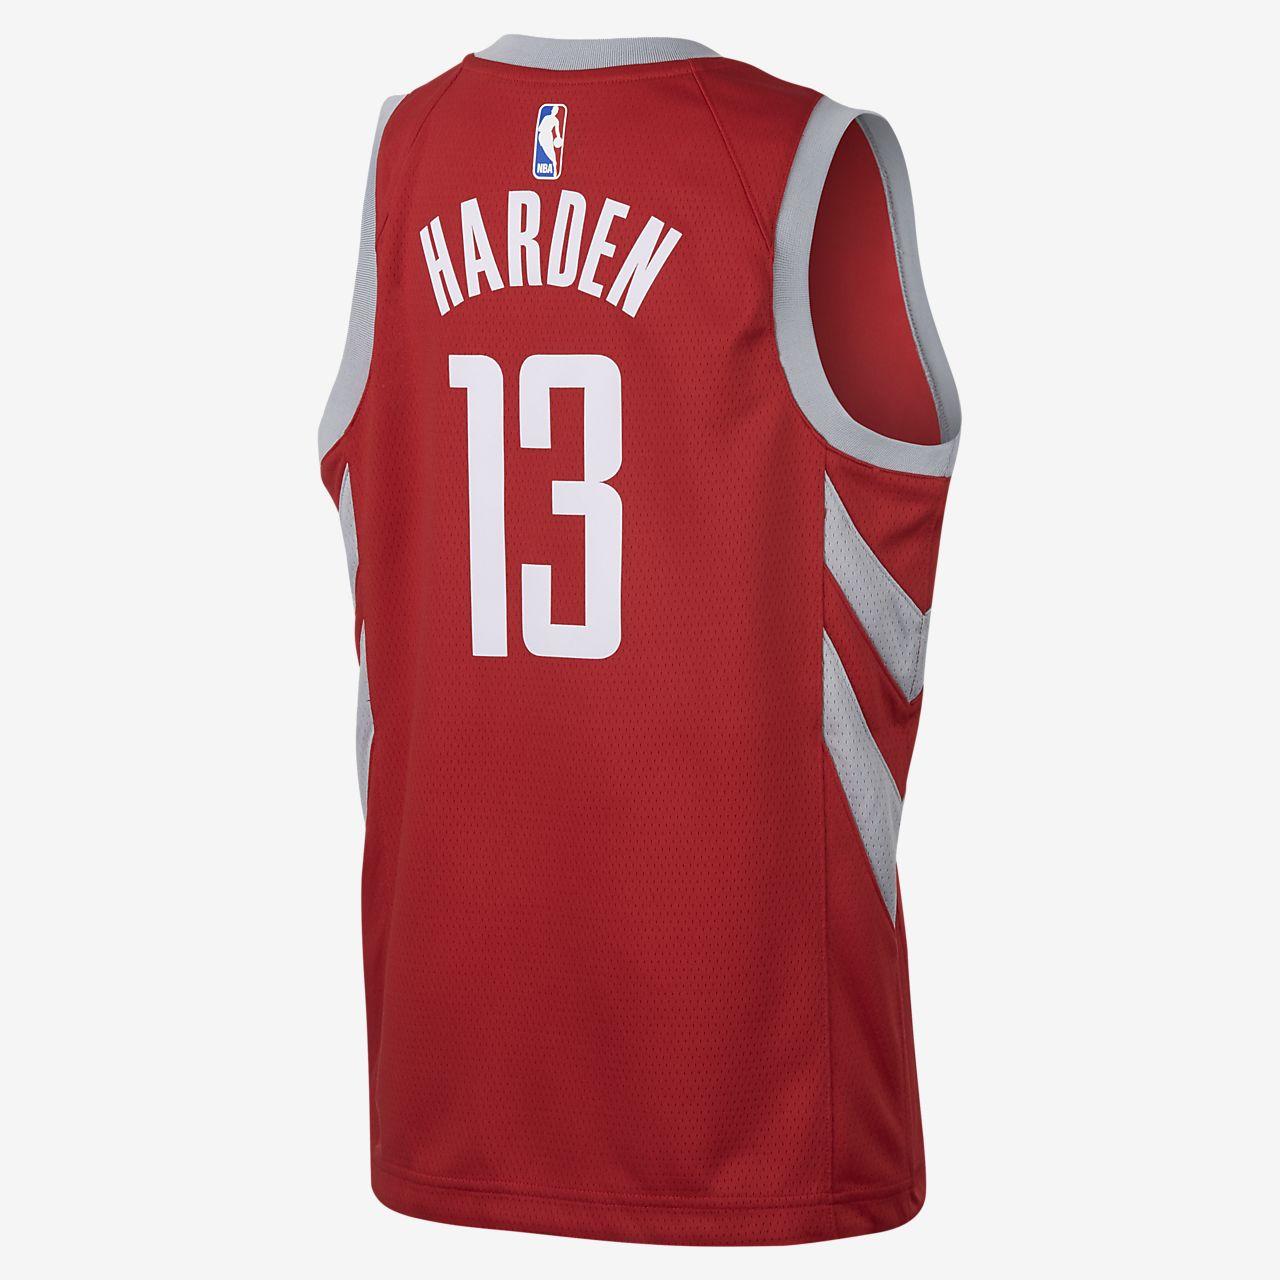 finest selection 4adca 5b517 James Harden Houston Rockets Nike Icon Edition Swingman Big Kids' NBA Jersey